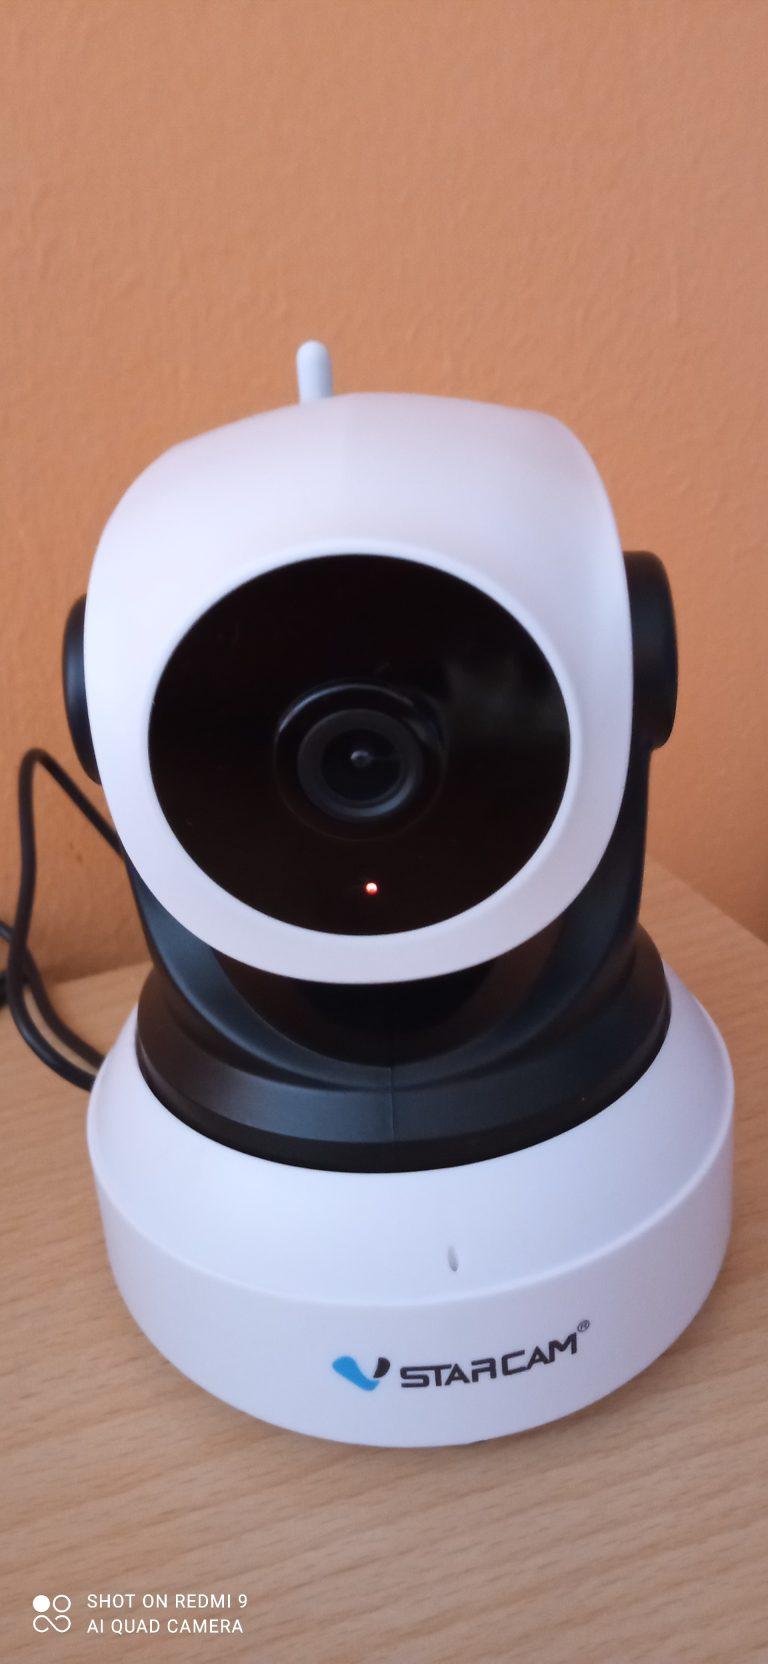 HD Wifi Nadzorna Kamera s 360° pregledom YOUSEE photo review